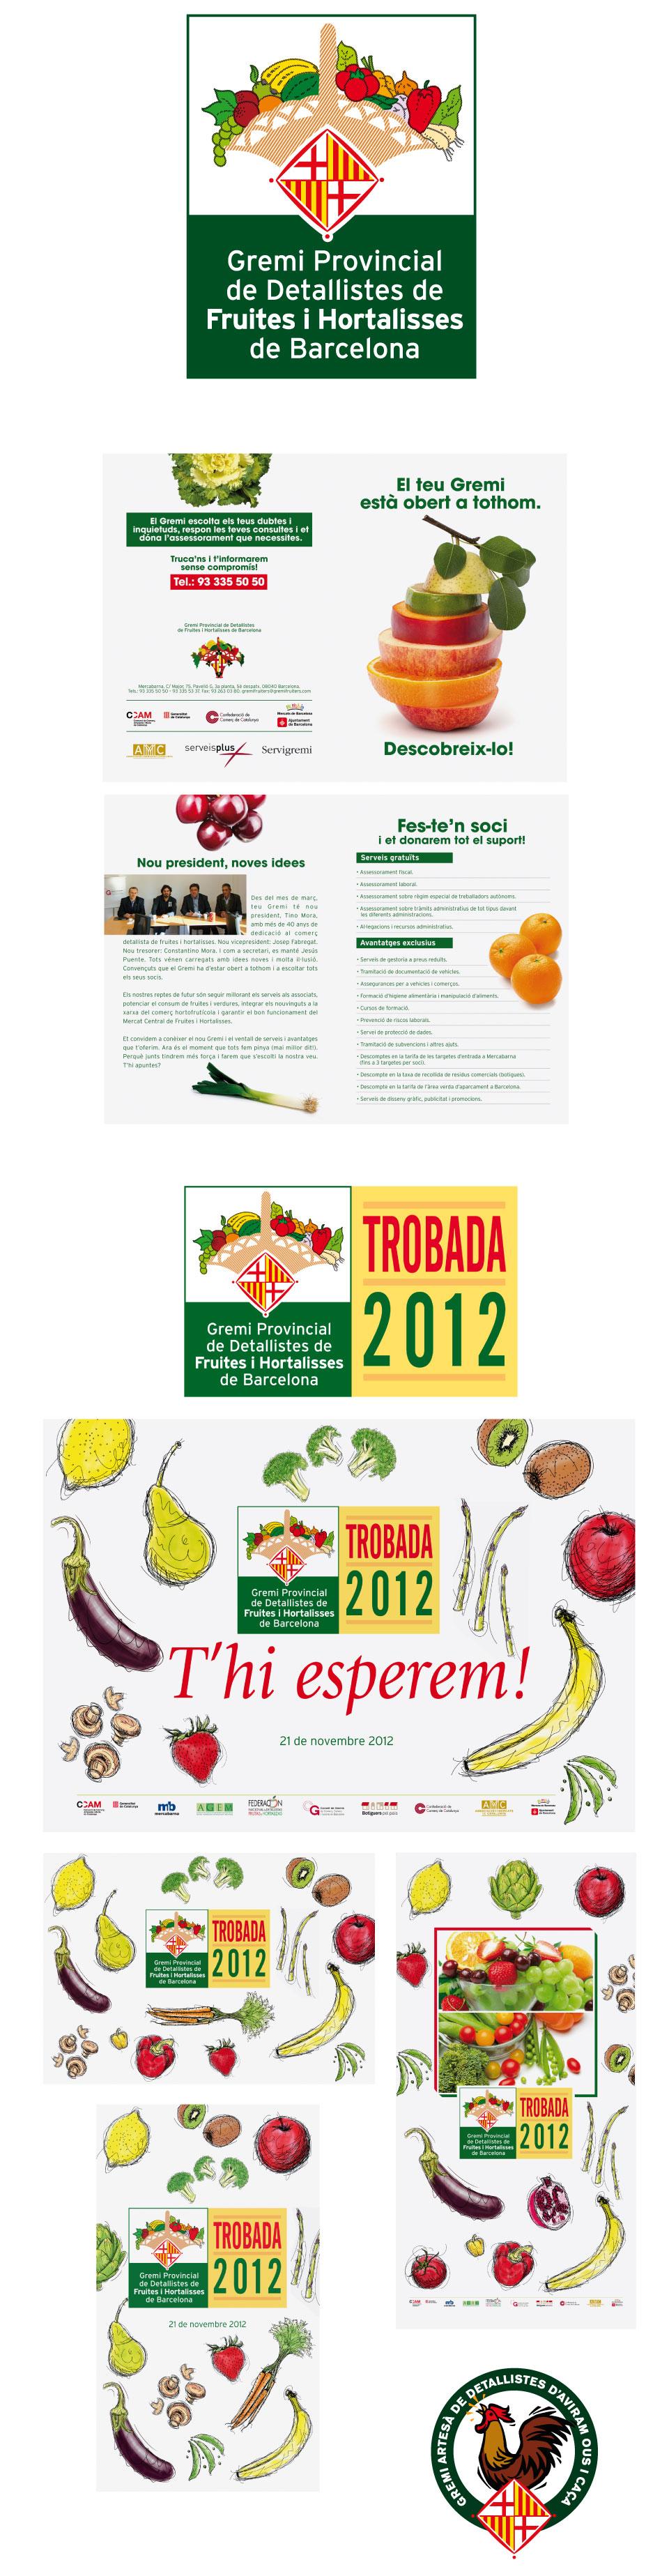 Logotipos, packaging y trípticos del Gremi Provincial de Detallistes de Fruites i Hortalisses de Barcelona